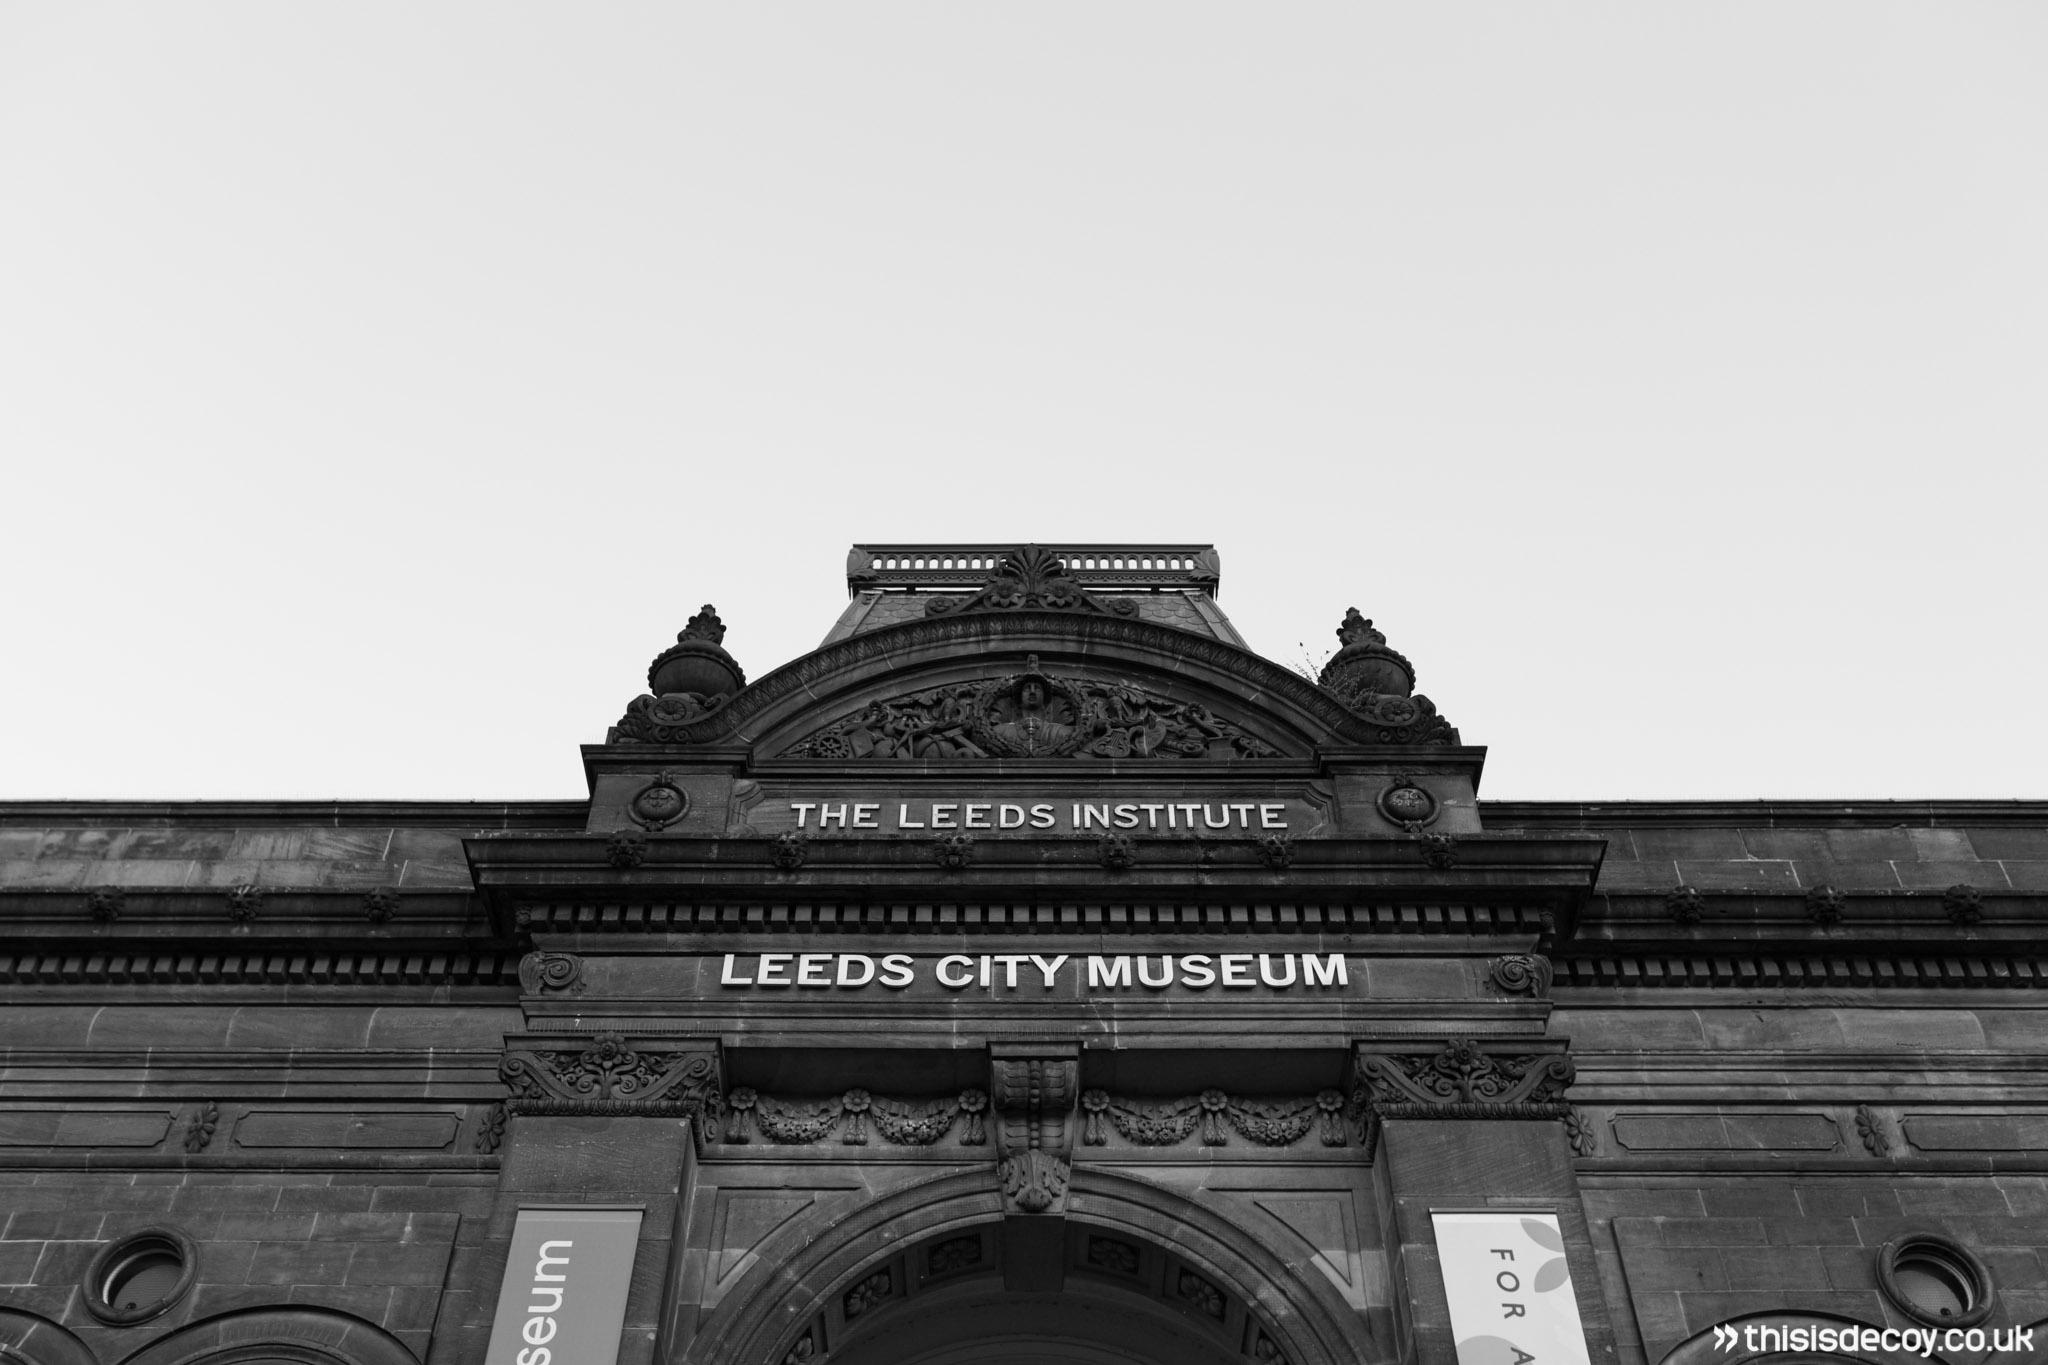 Northern Light - Bob Barker - Leeds City Museum - 20 Jan 17 - Decoy Media - 1.jpg